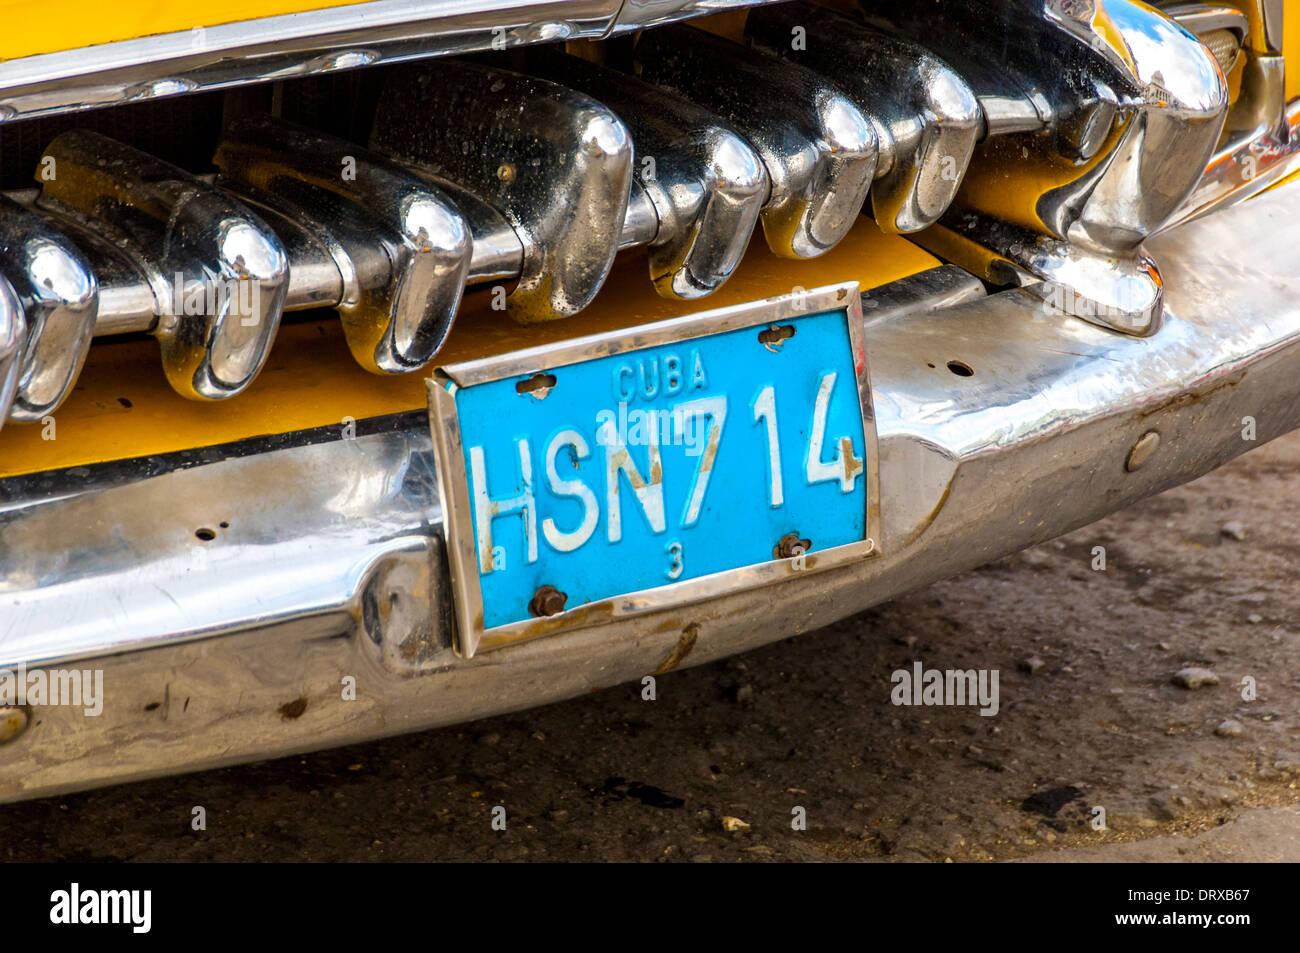 Design 1950s Stock Photos Images Alamy 1950 American Motors Wiring Diagram Motor Cars From Havana Cuba Image